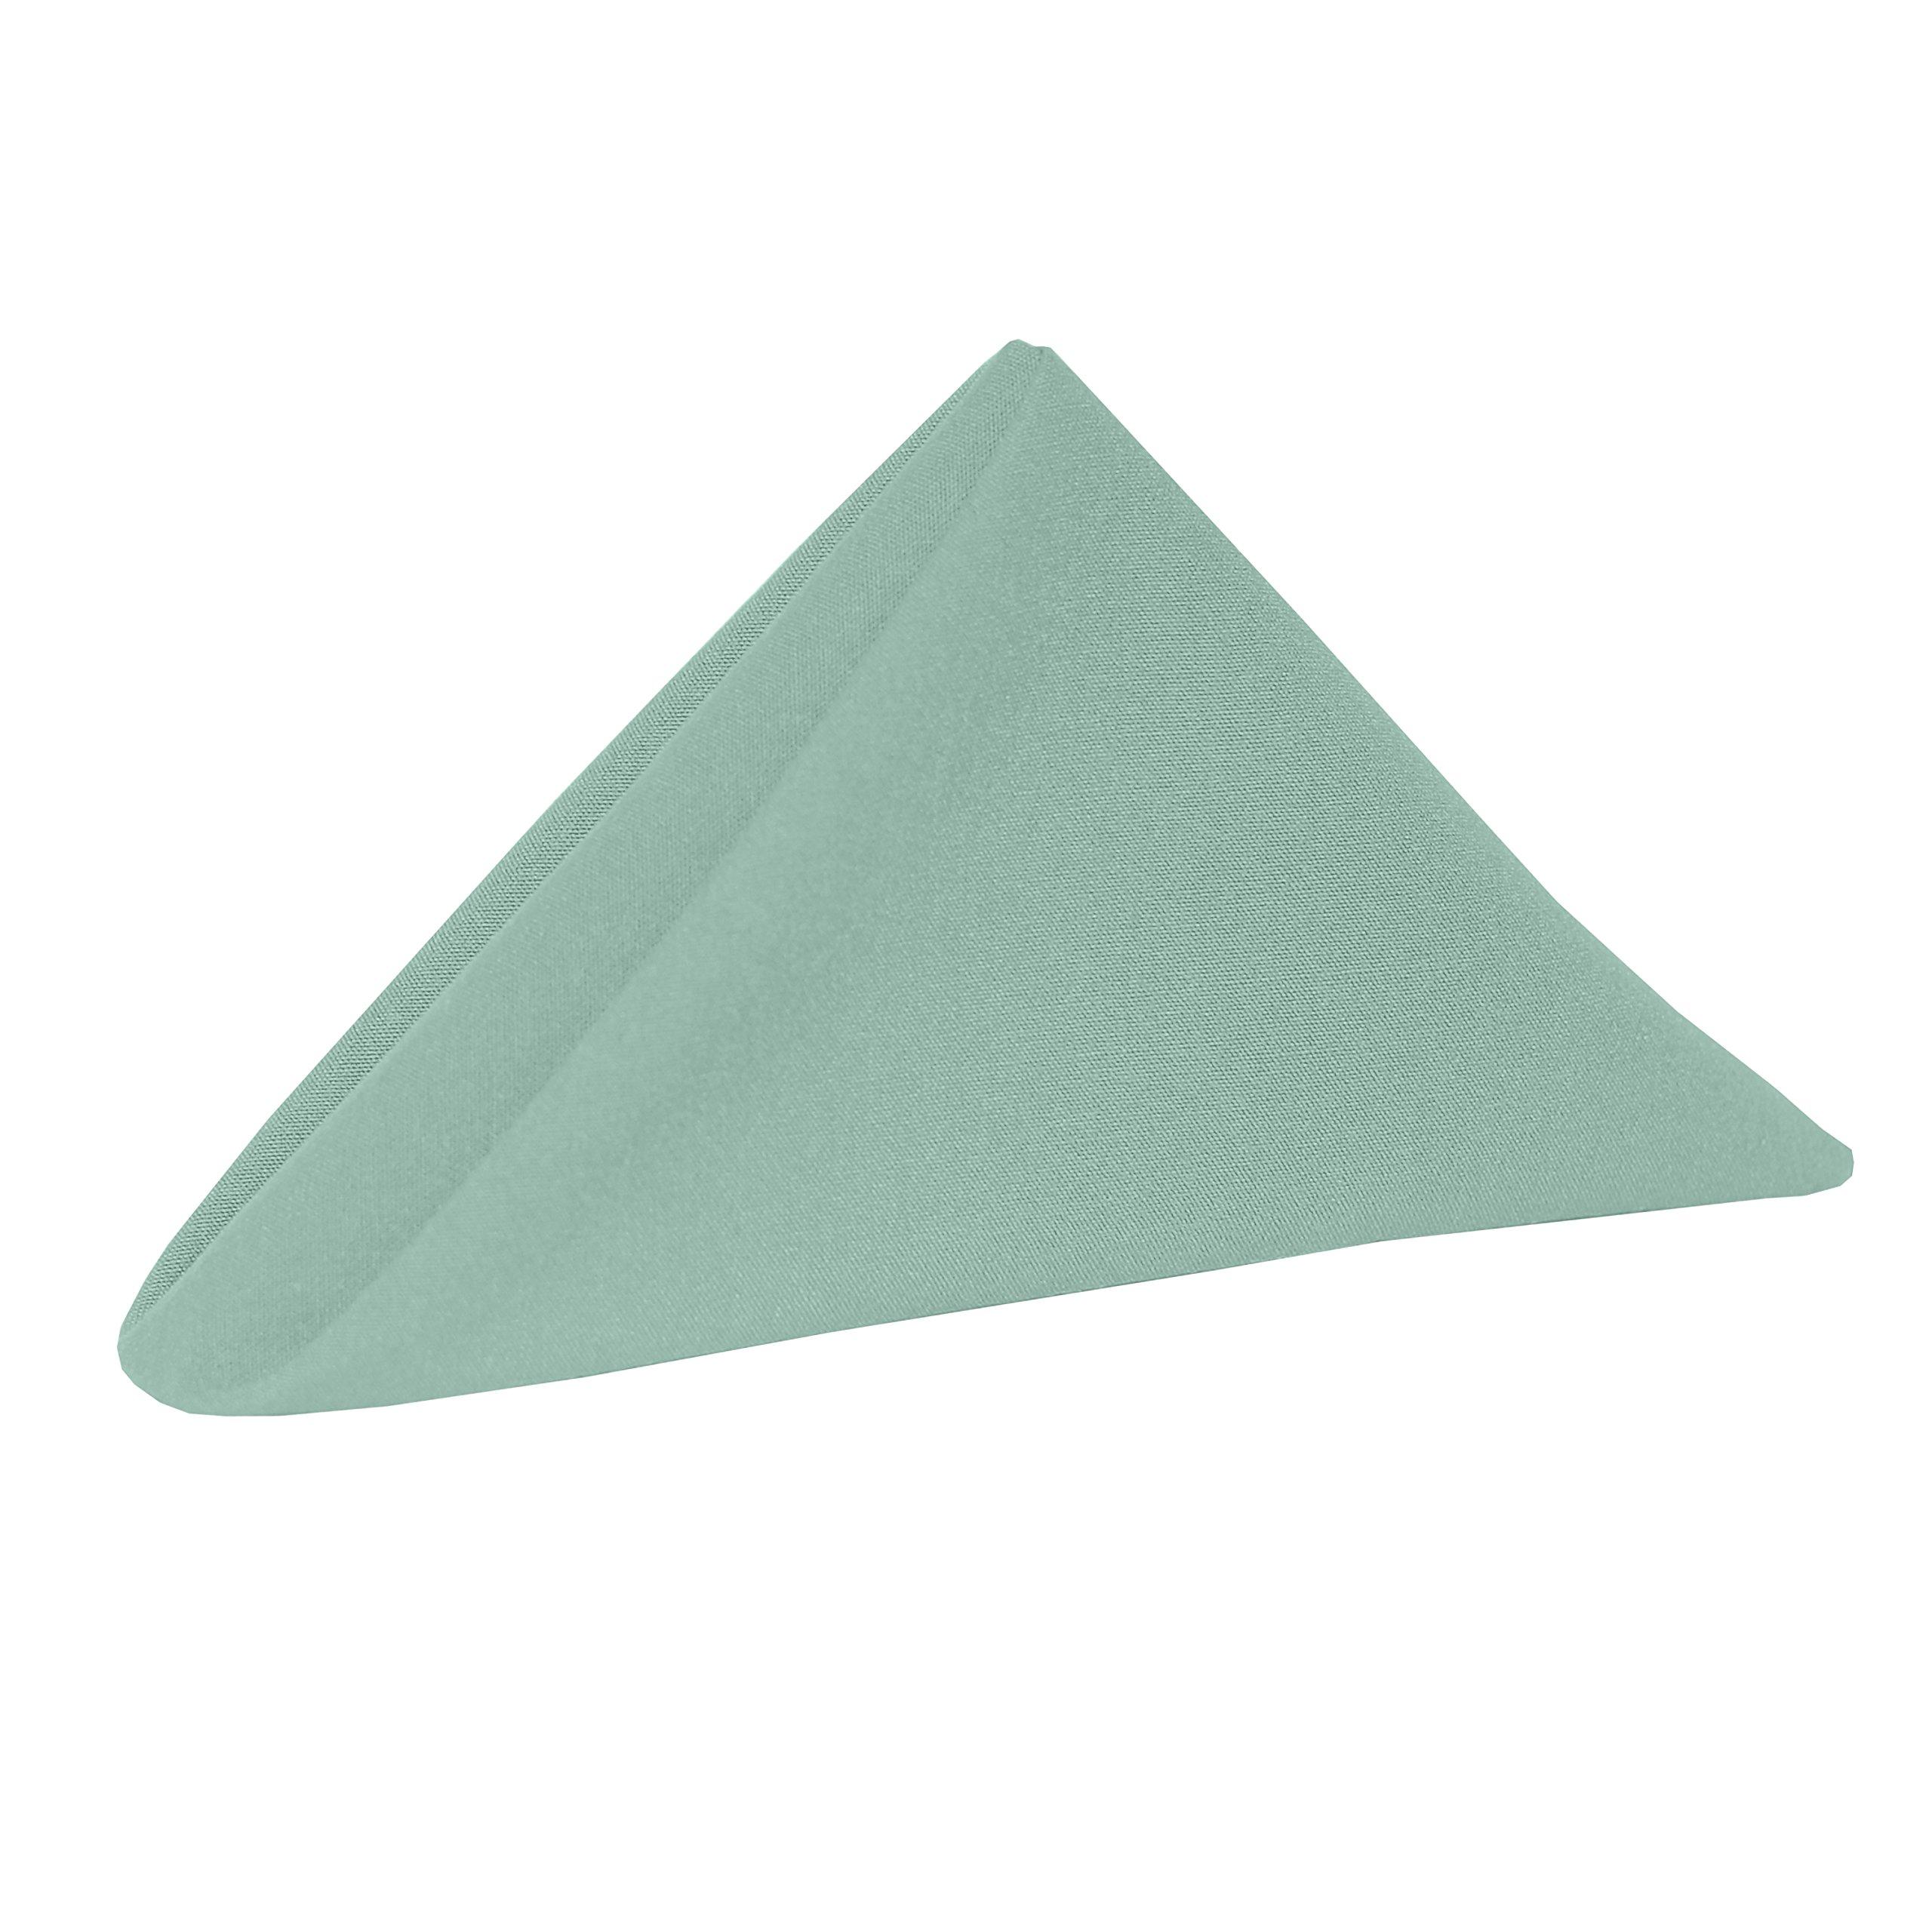 Ultimate Textile -10 Dozen- Cotton-Feel 17 x 17-Inch Cloth Napkins, Seamist Light Green